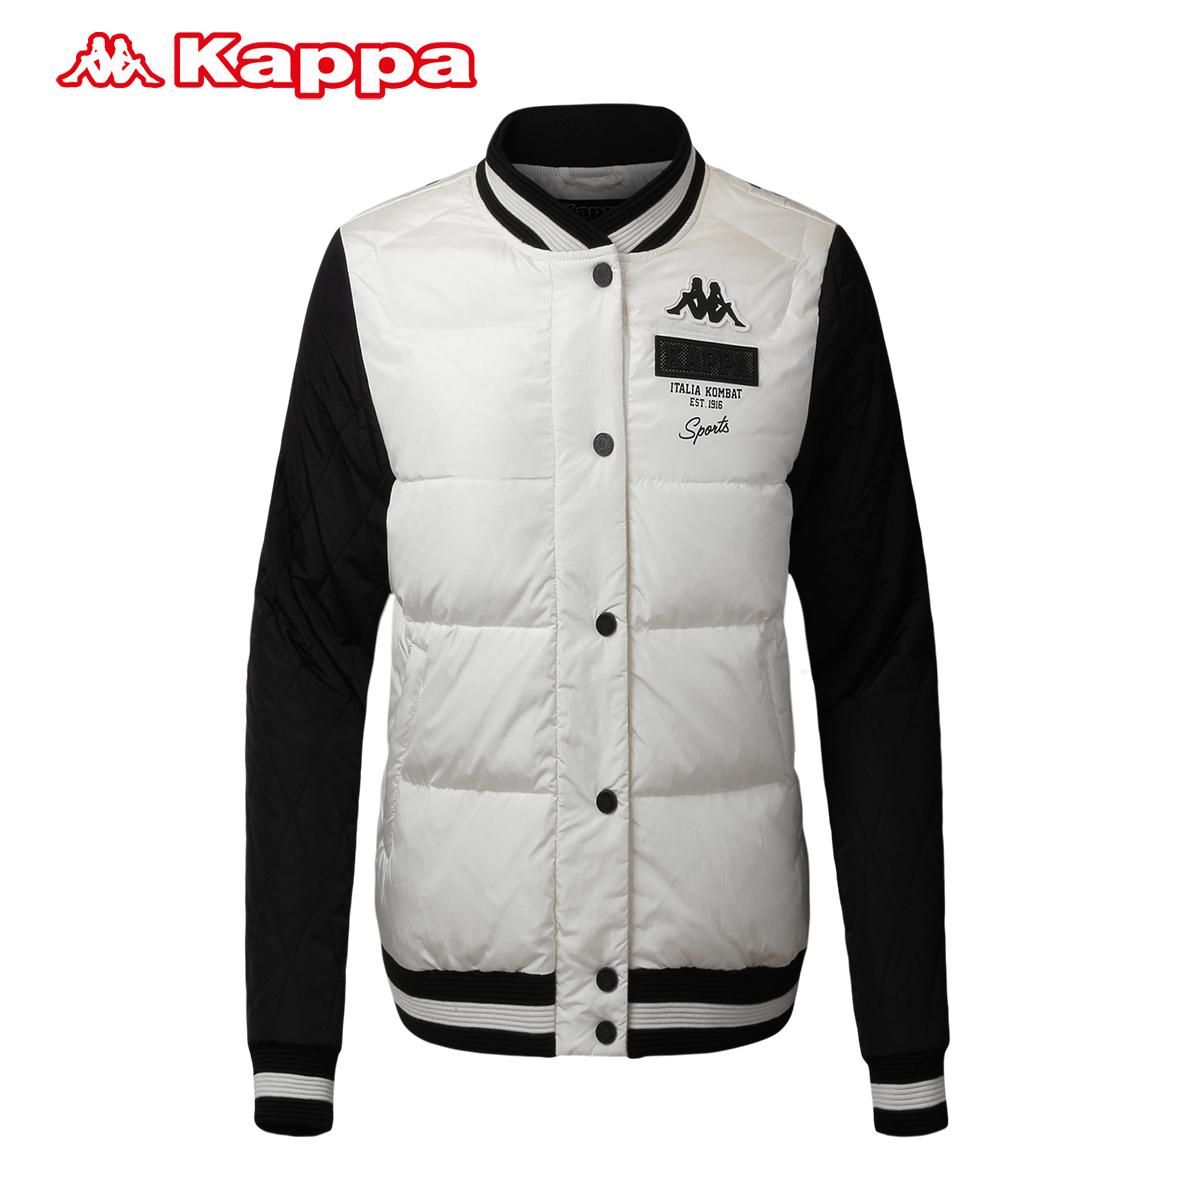 Kappa卡帕女款羽绒服轻薄立领运动外套女装棒球衫|K0562YY03